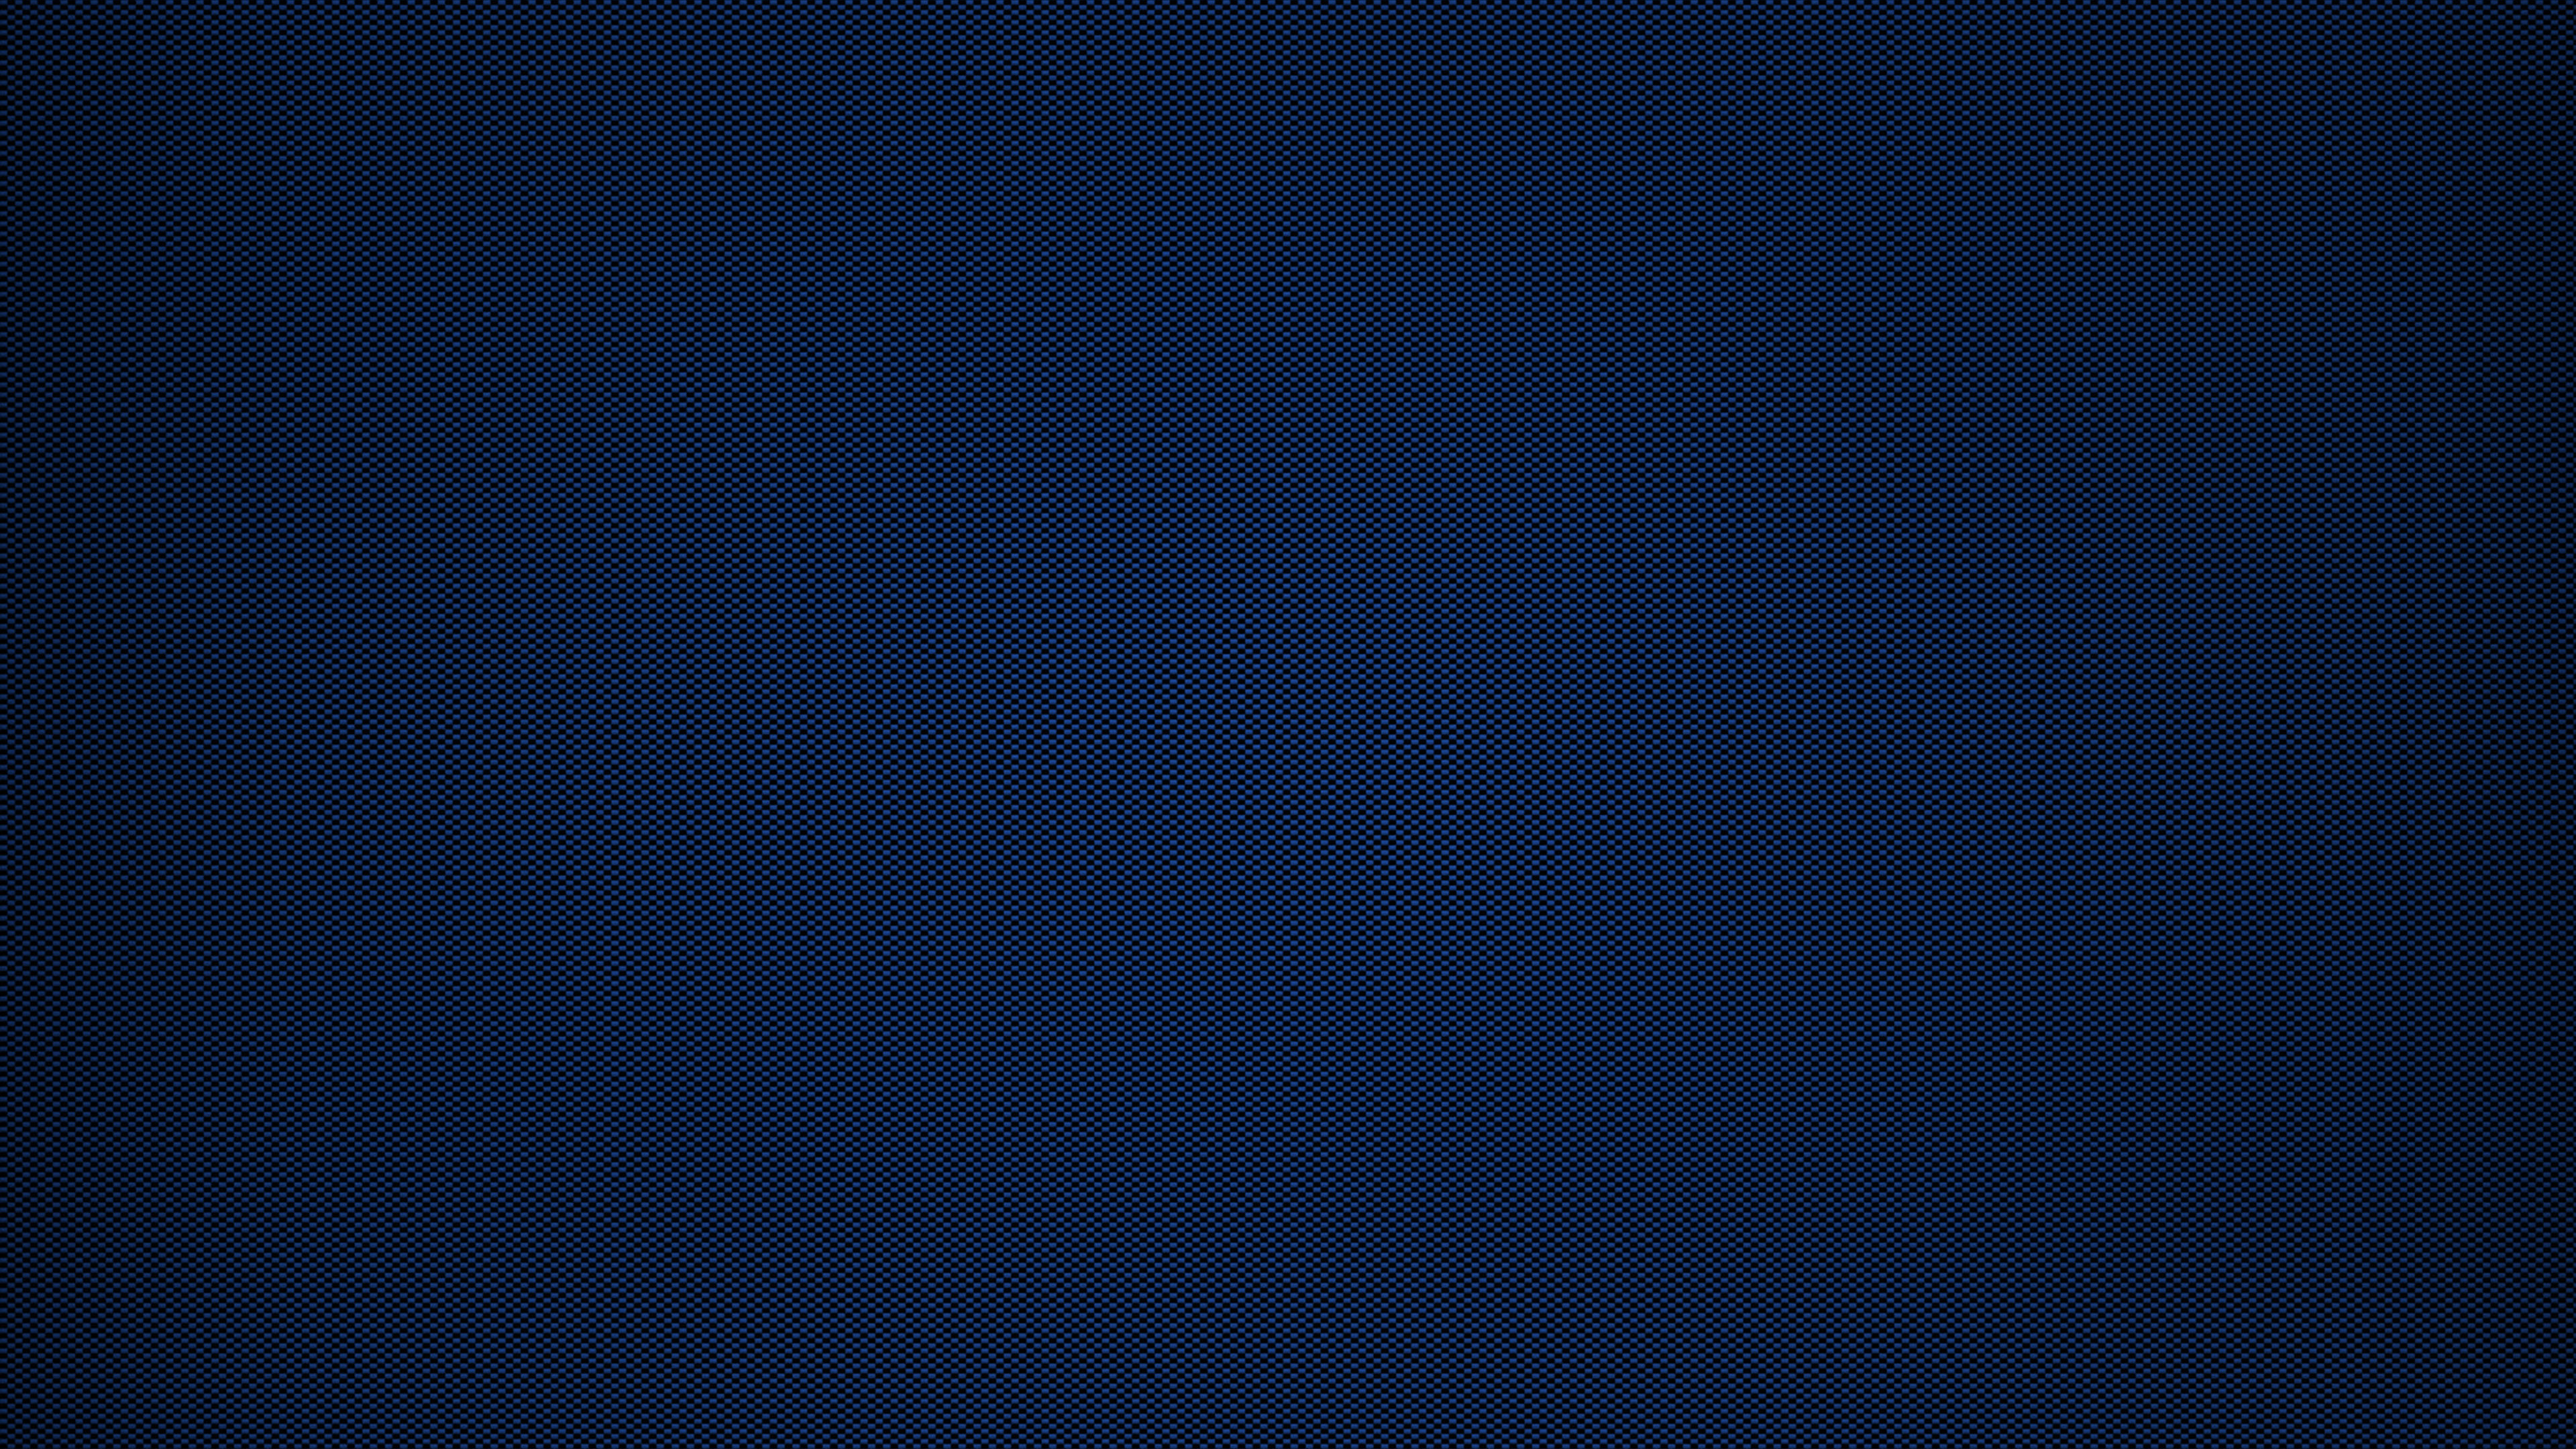 29+ Dark Navy Blue Wallpapers on WallpaperSafari